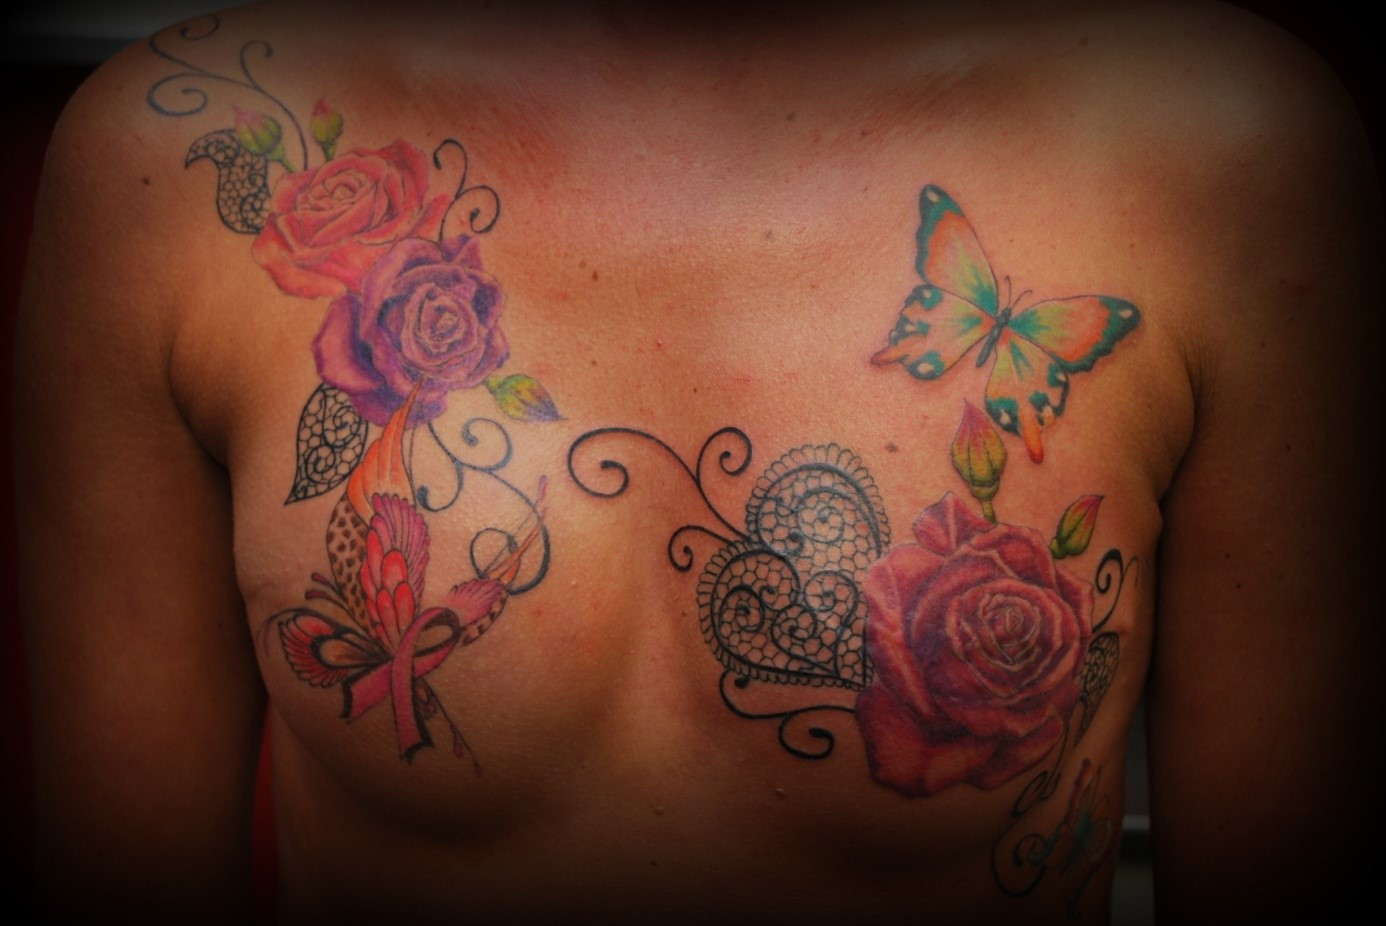 Medische Tatoeage Tattoo Amp Piercingstudio Jinxtattoo Amp Piercingstudio Jinx